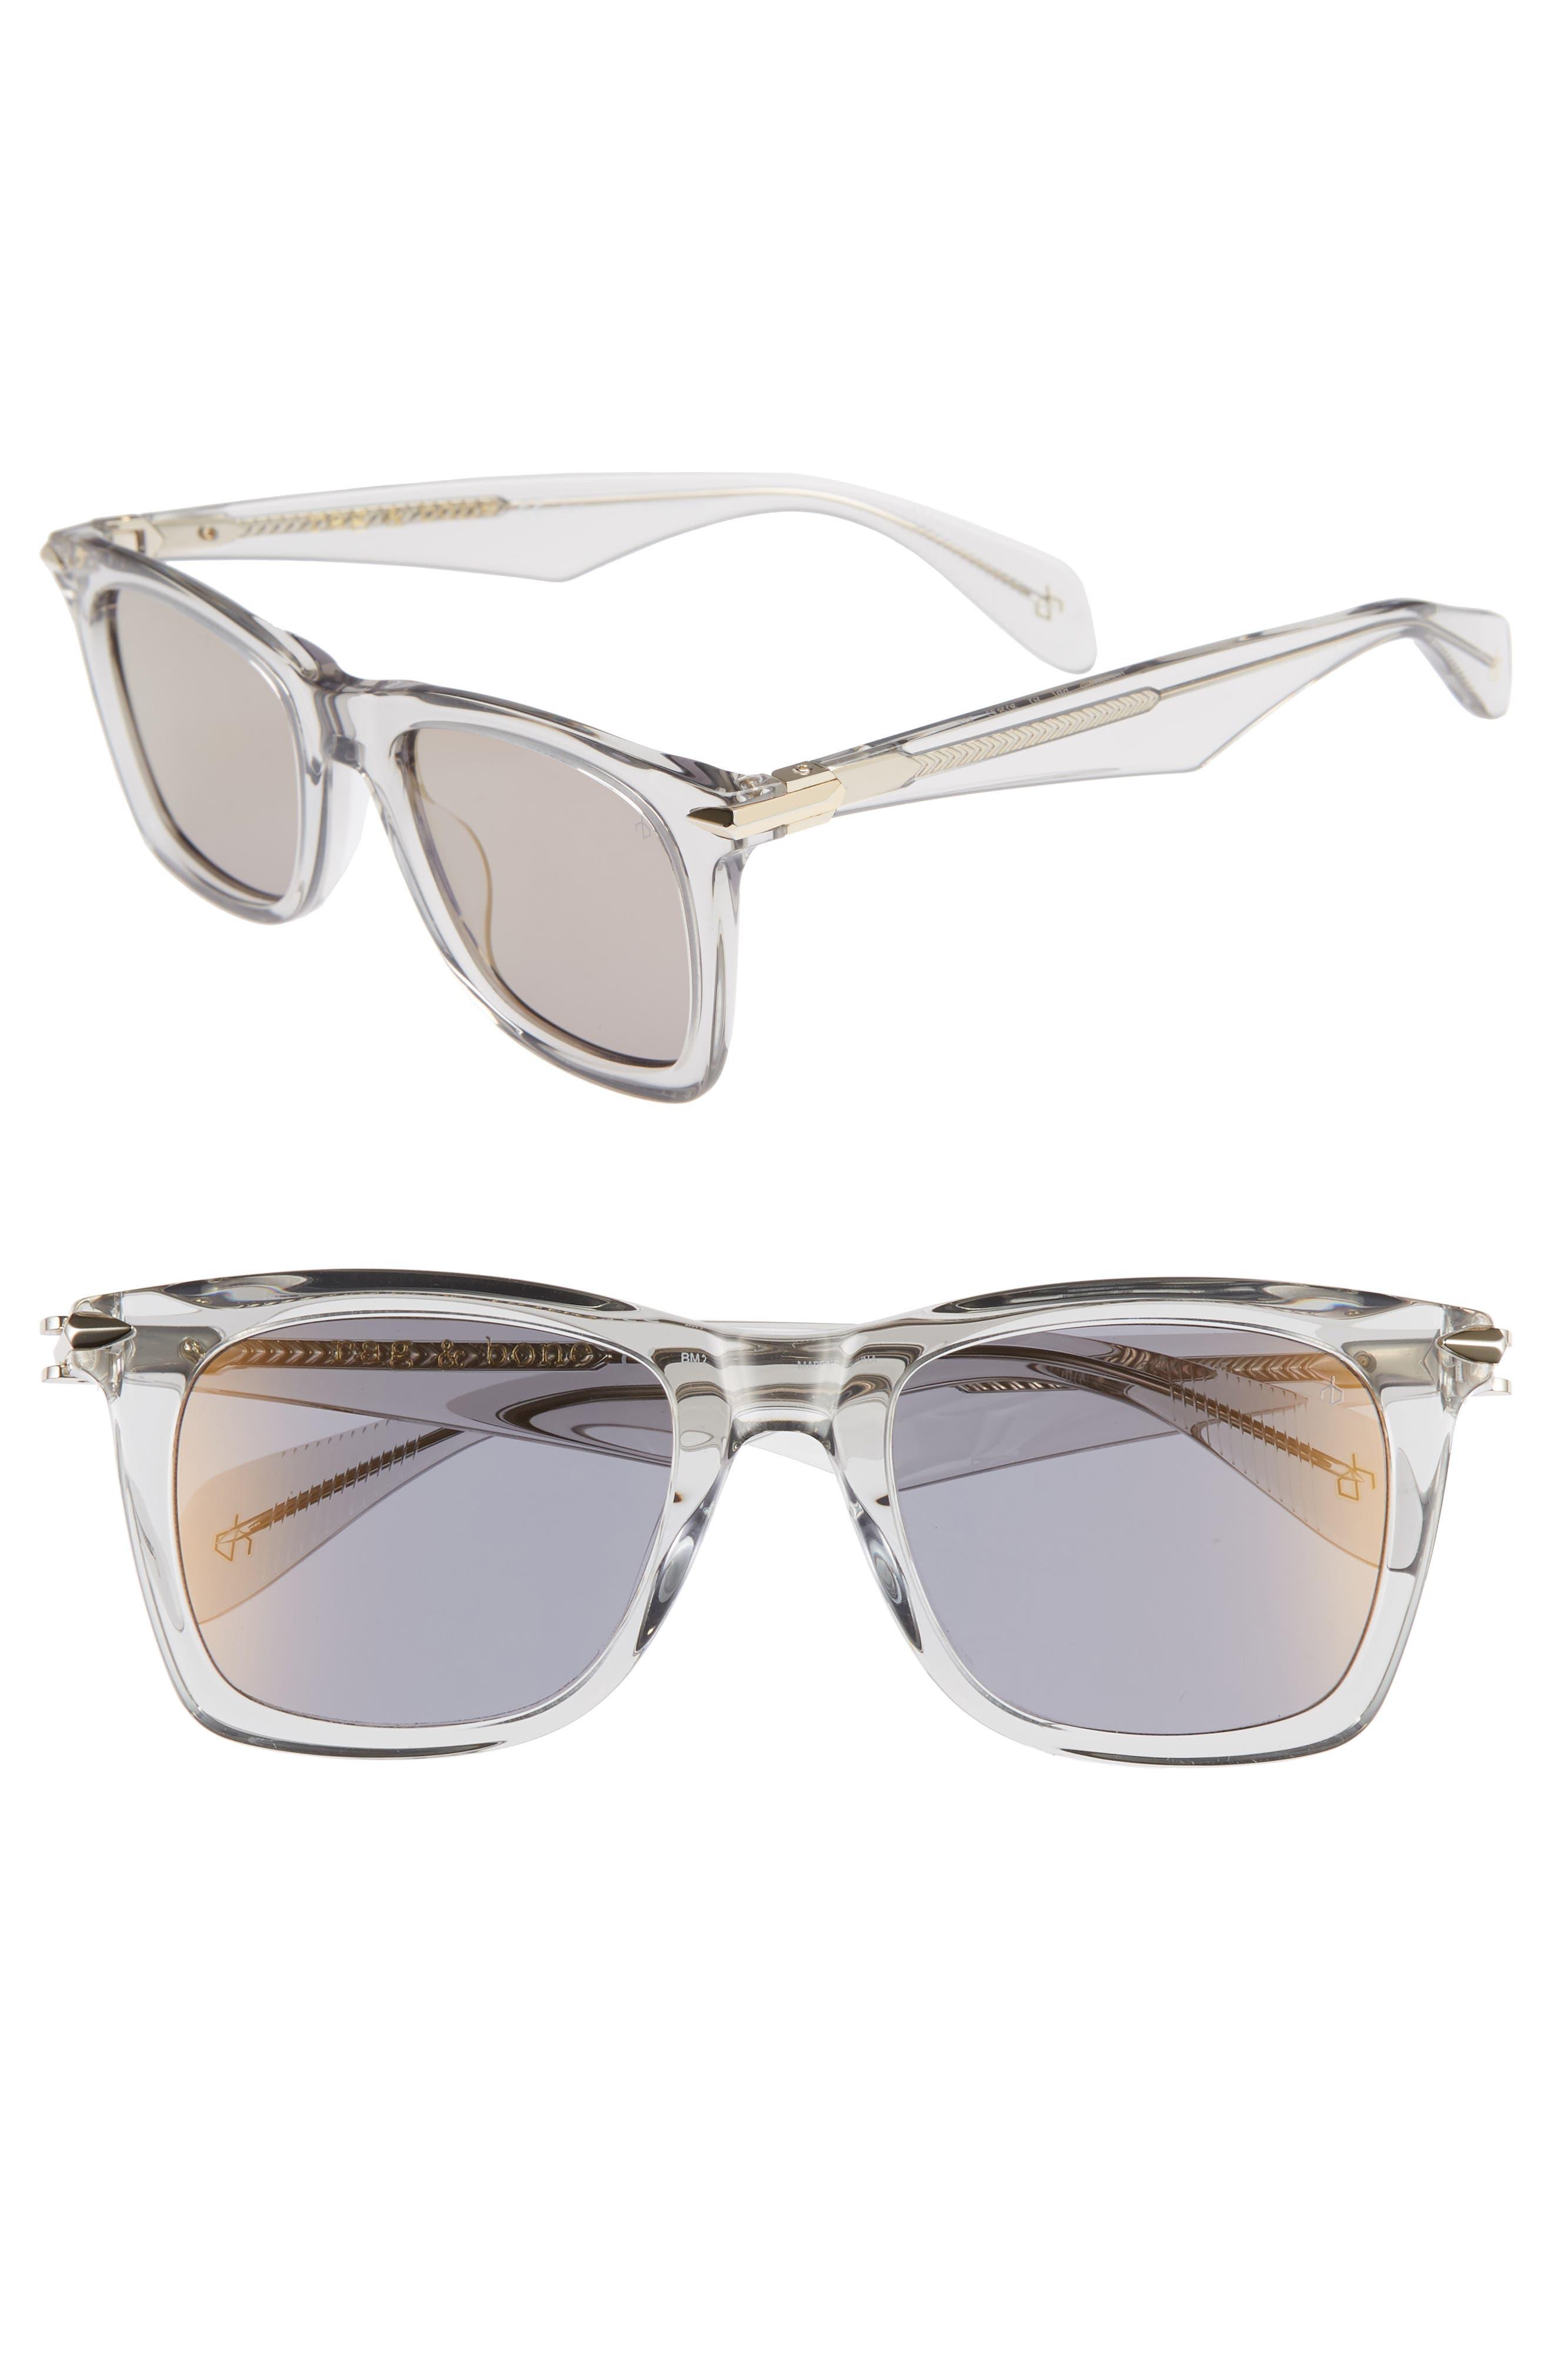 4933b2058898 Rag & Bone 5m Gradient Sunglasses - Grey